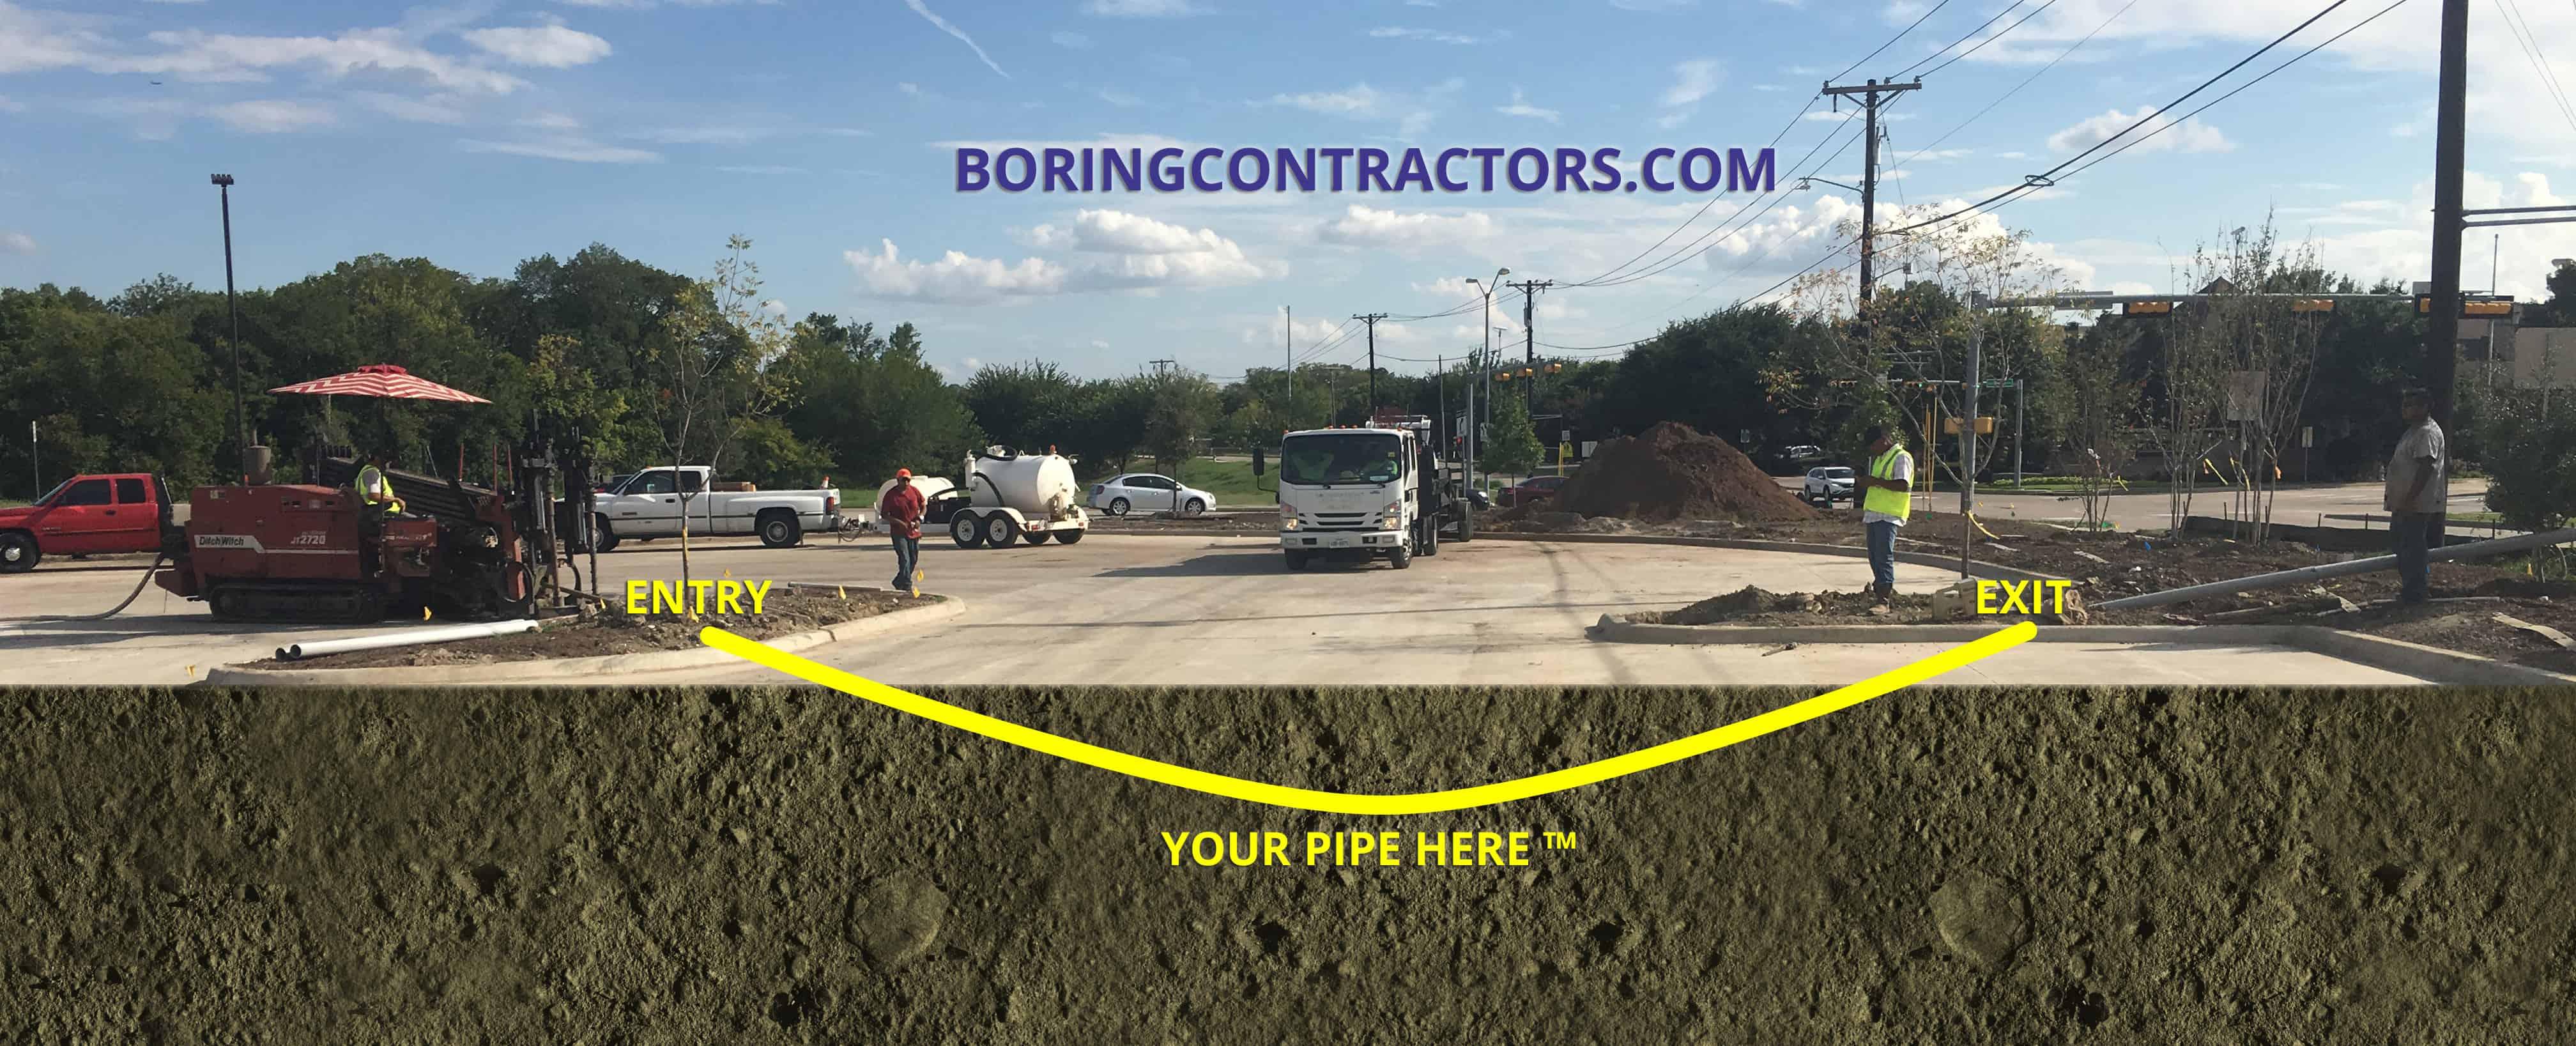 Construction Boring Contractors Lakewood Township, NJ